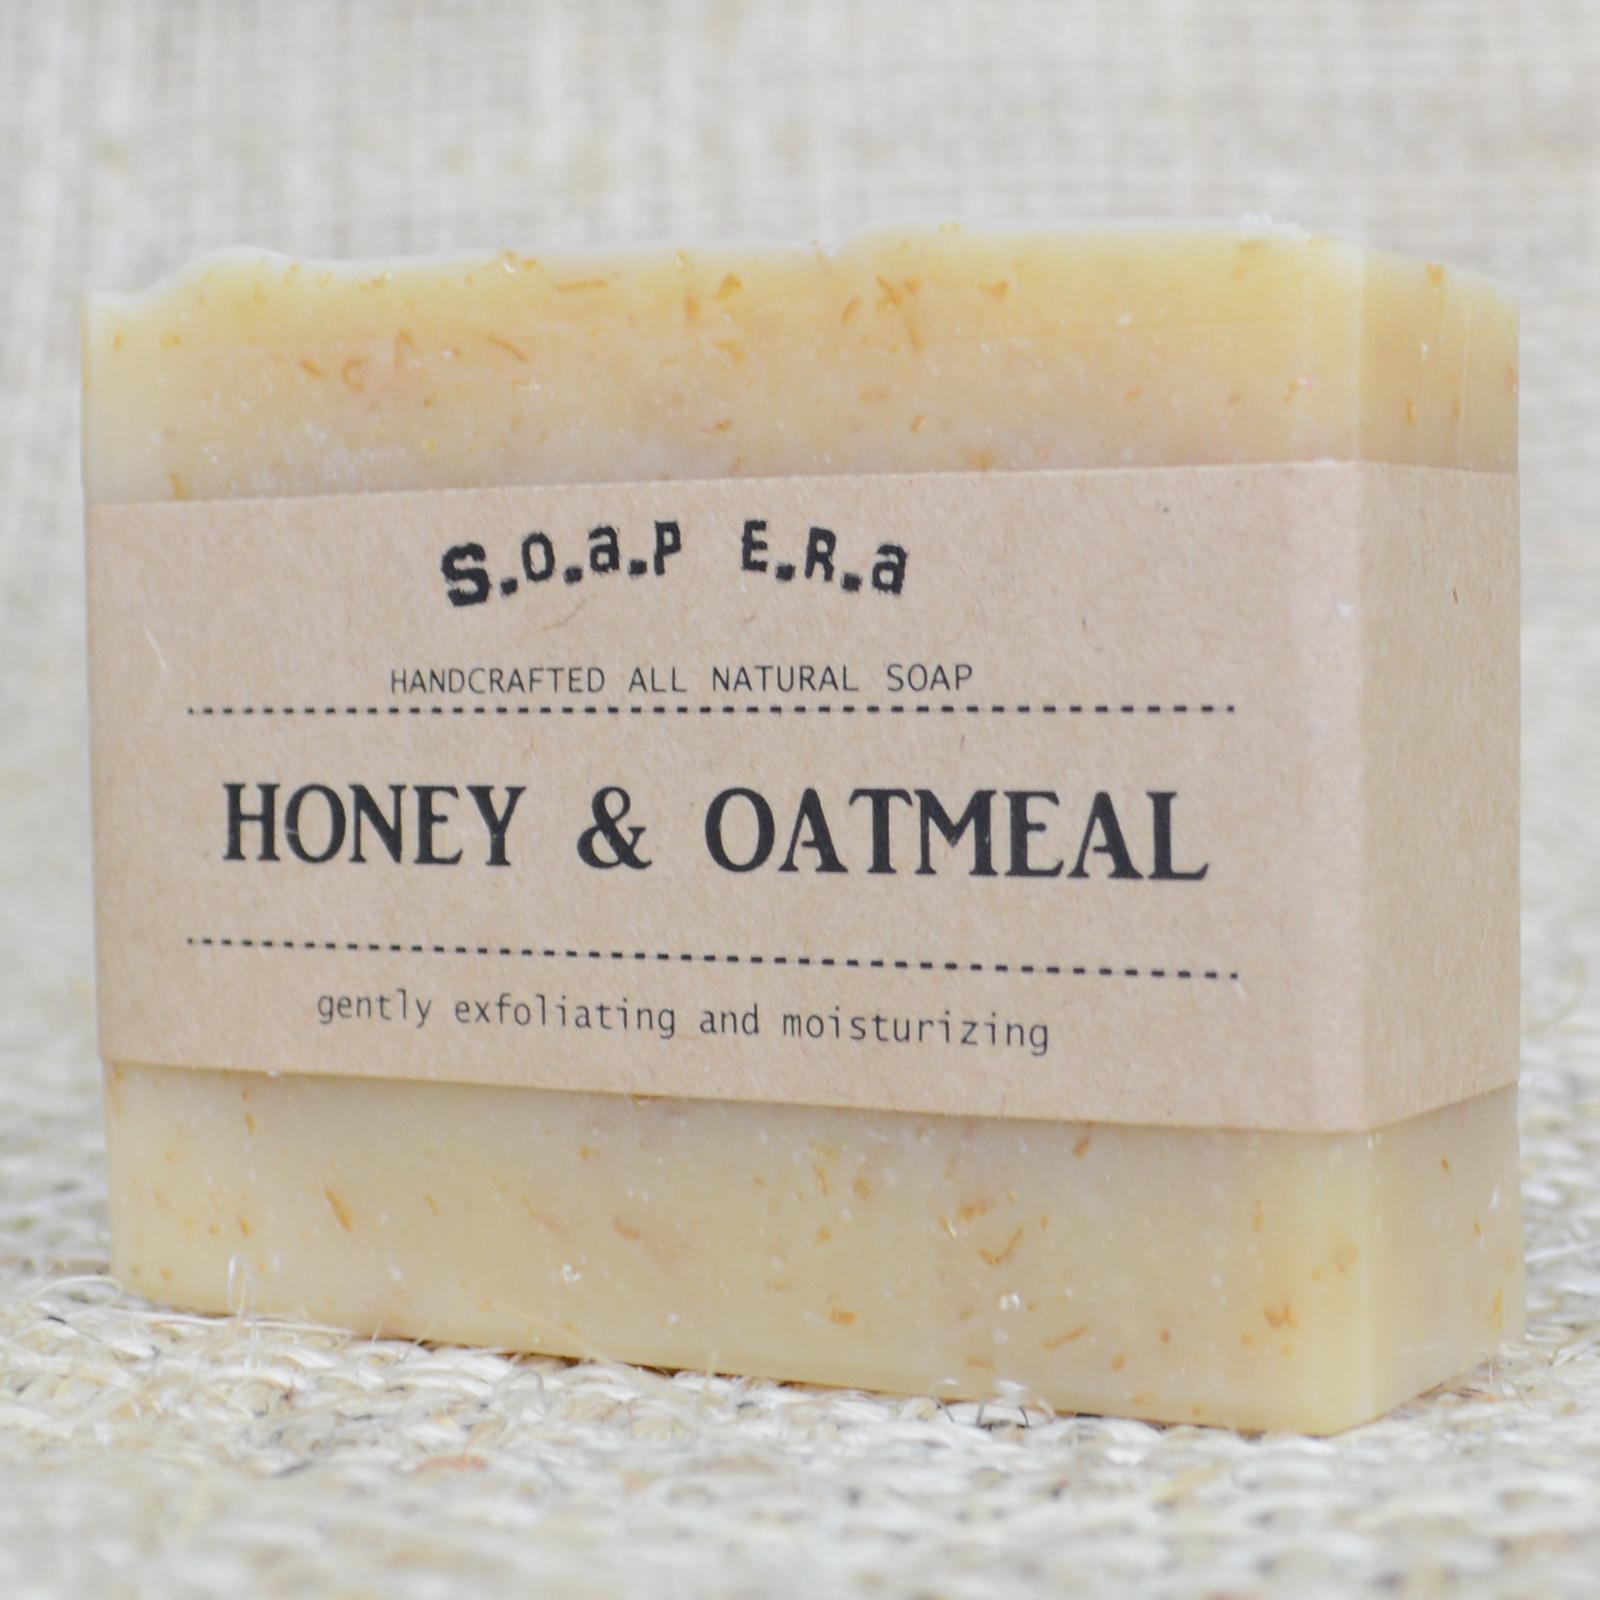 Honey Oatmeal gently exfoliating soap | SOAP ERA